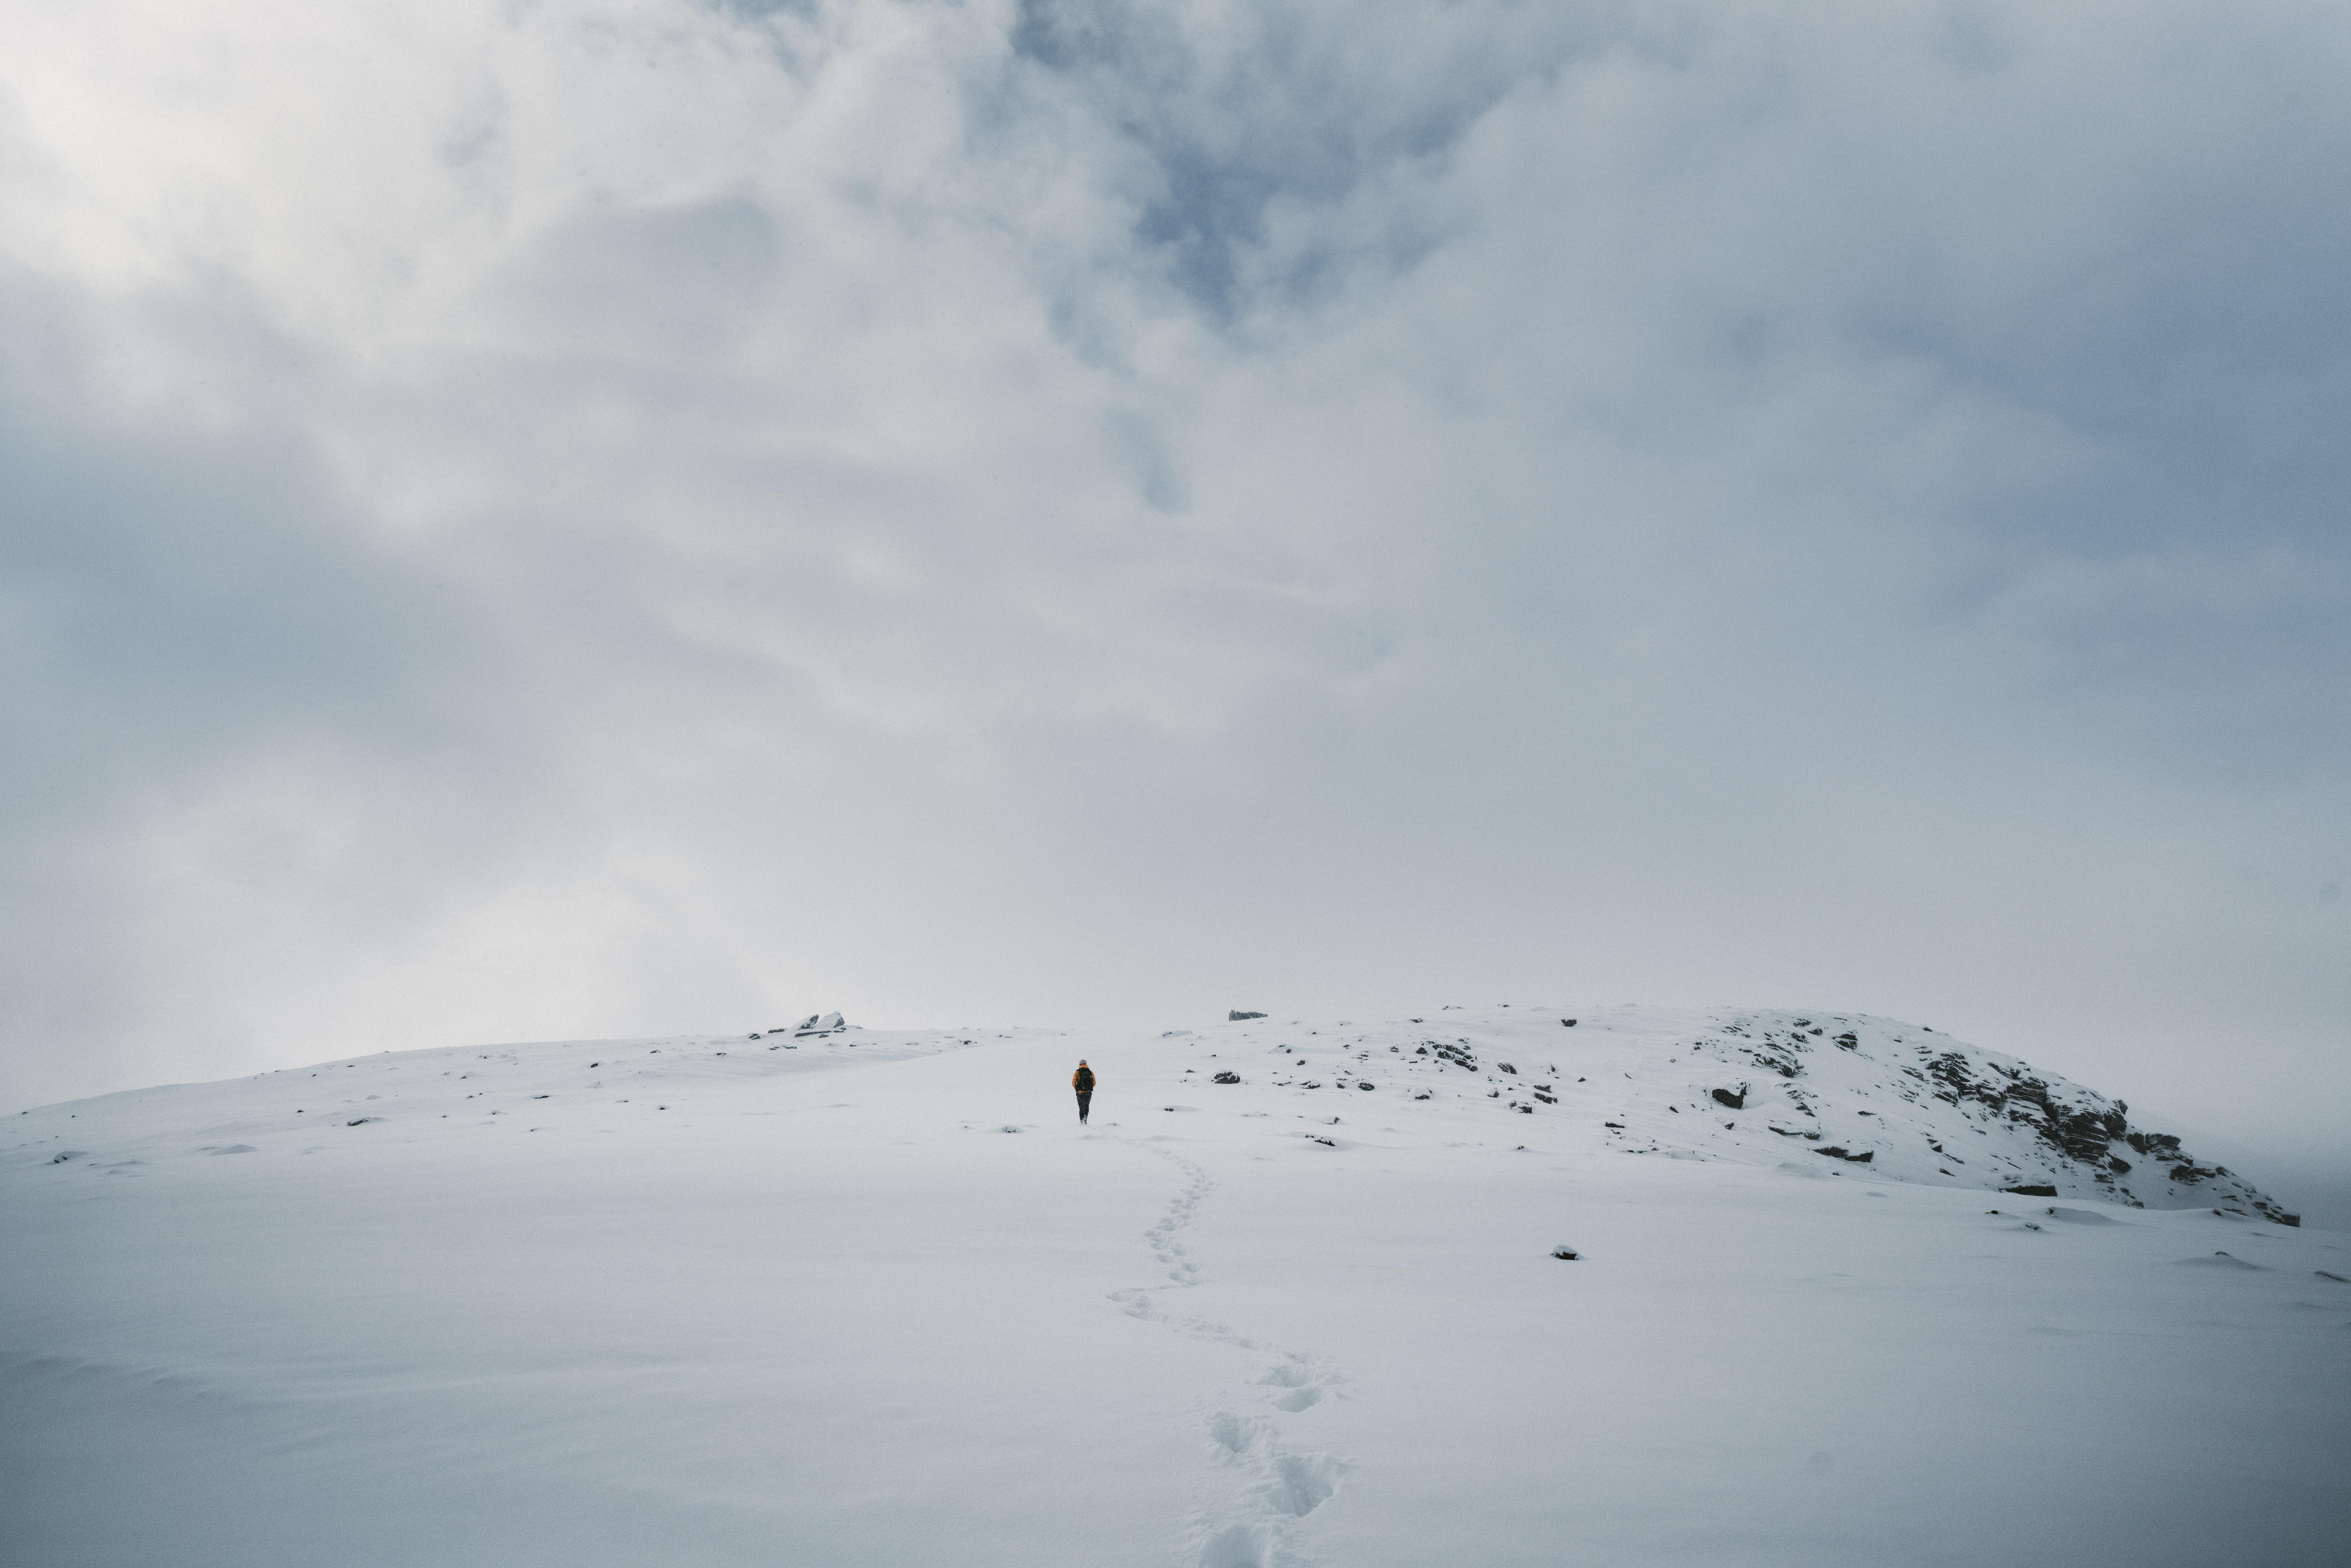 person walking on mountain during winter season